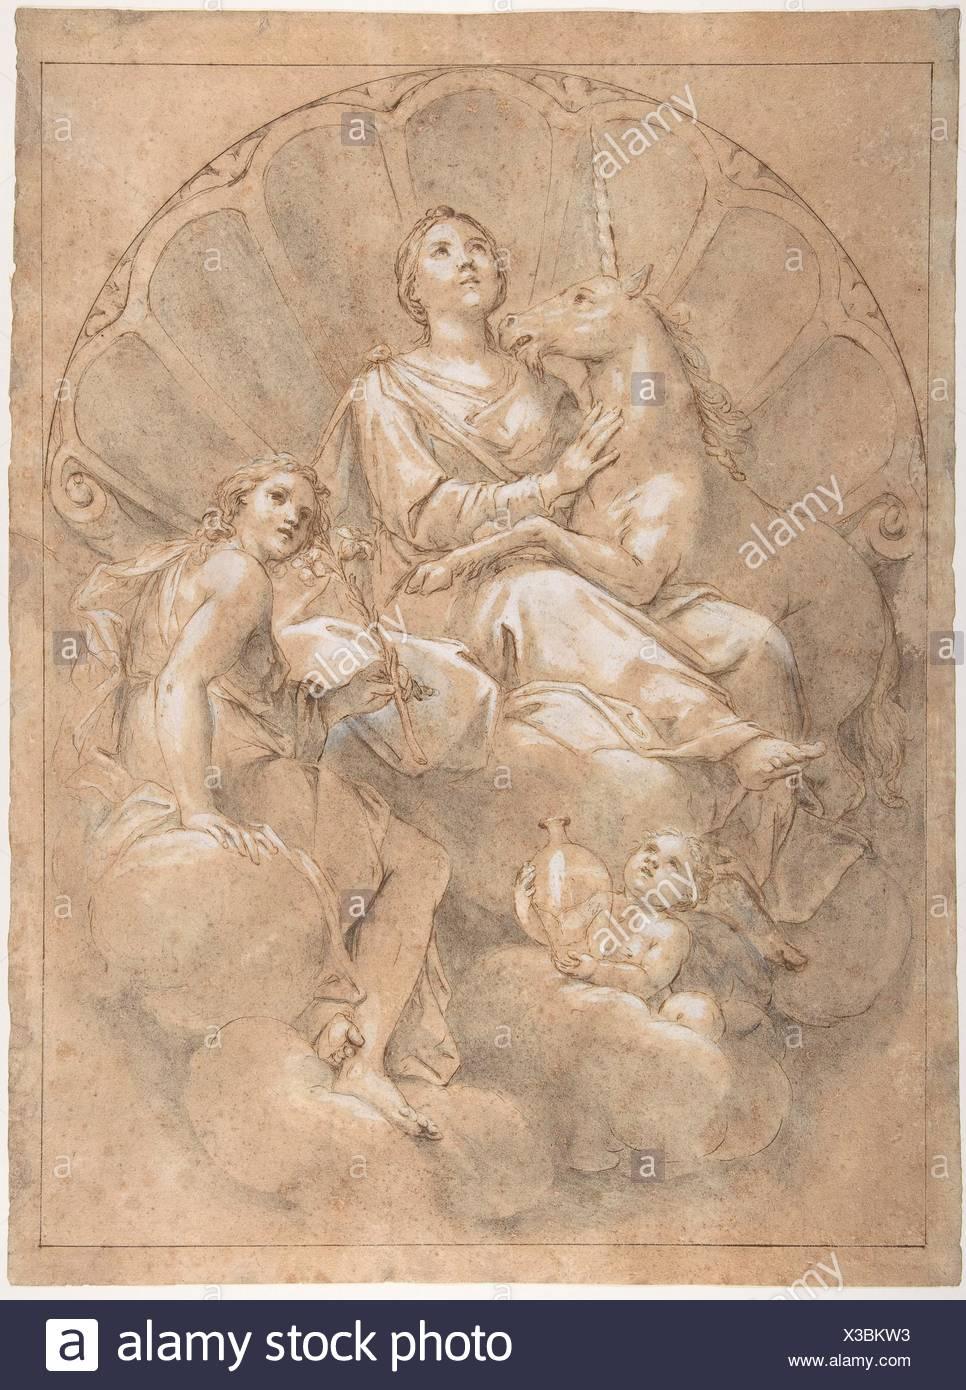 Allegorical Figure of Purity with a Unicorn. Artist: Marcantonio Franceschini (Italian, Bologna 1648-1729 Bologna); Date: 1688-89; Medium: Pen and - Stock Image